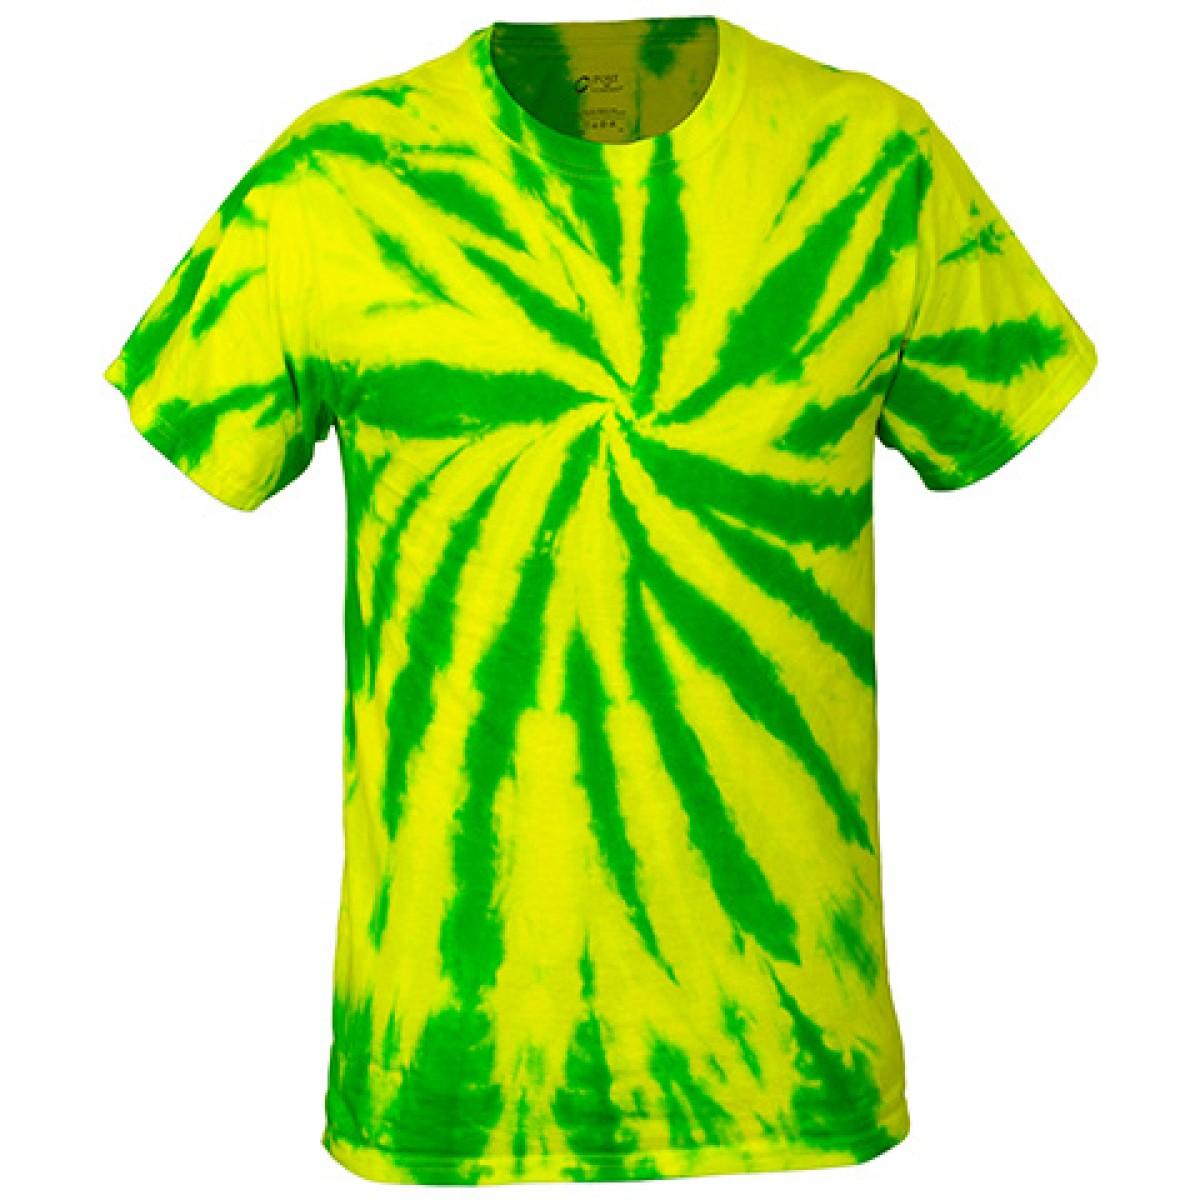 Multi-Color Tie-Dye Tee -Neon Green-3XL